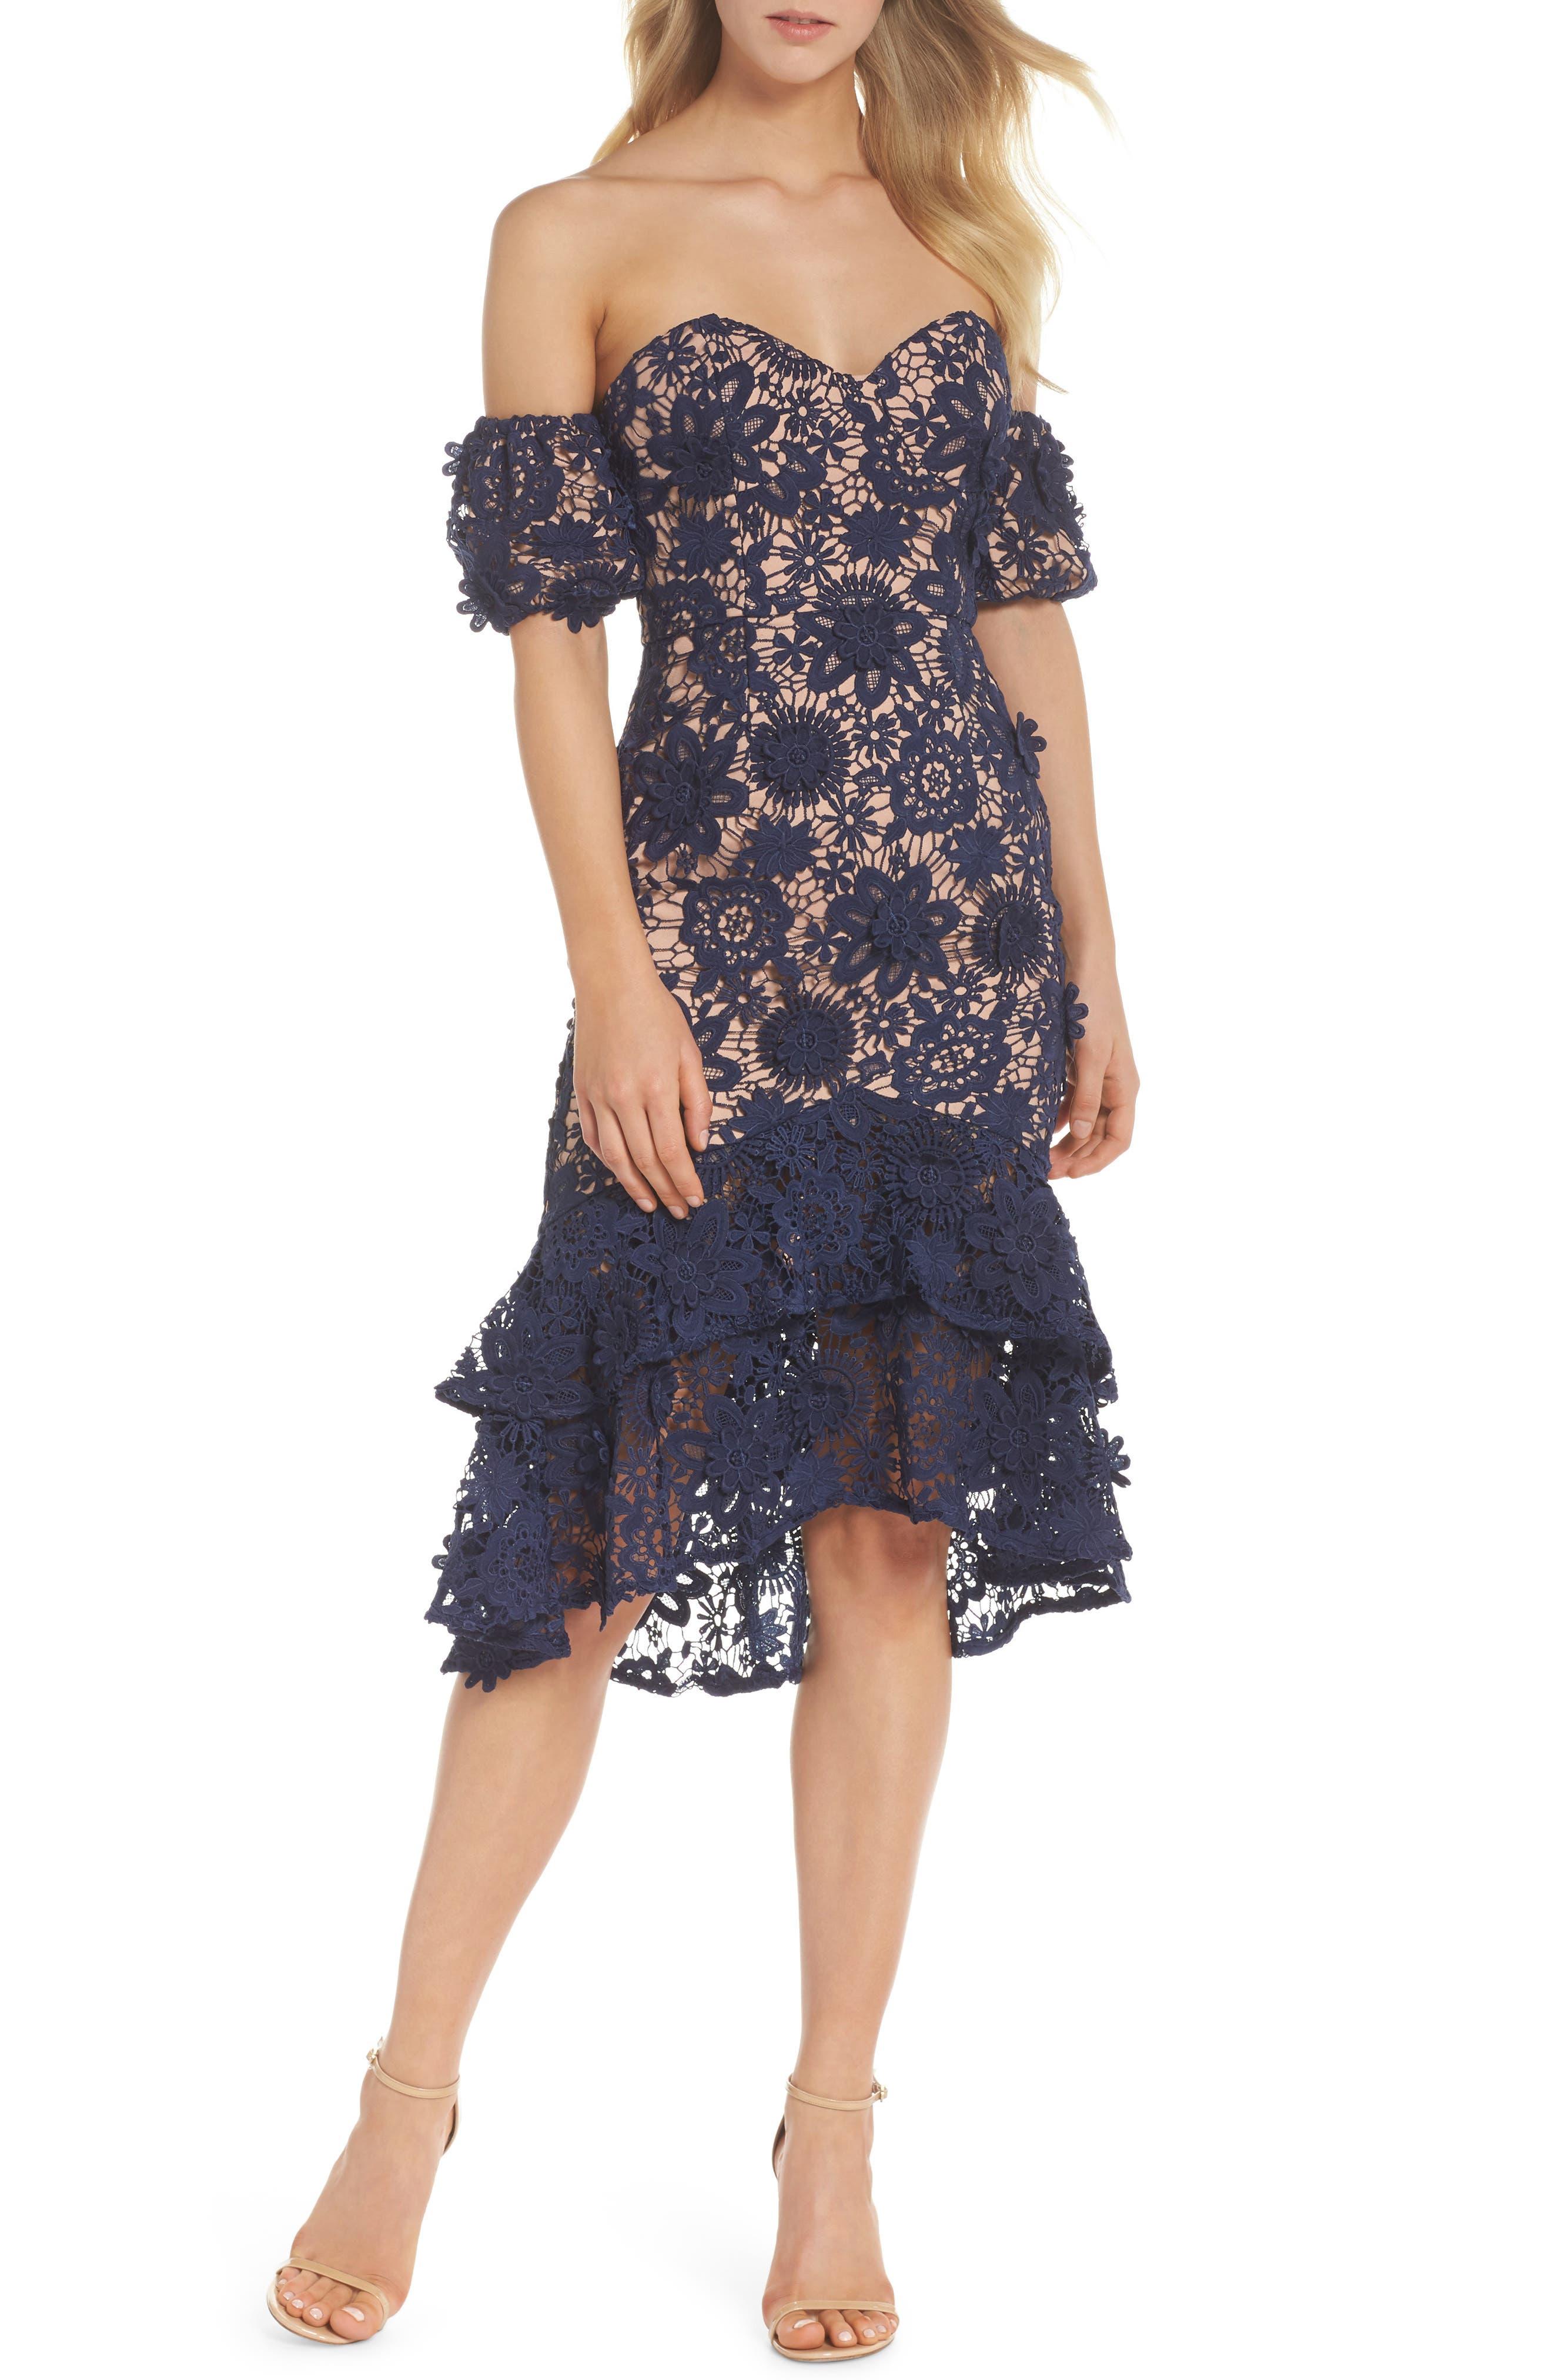 Merrilee Off the Shoulder 3D Lace Dress,                             Main thumbnail 1, color,                             NAVY